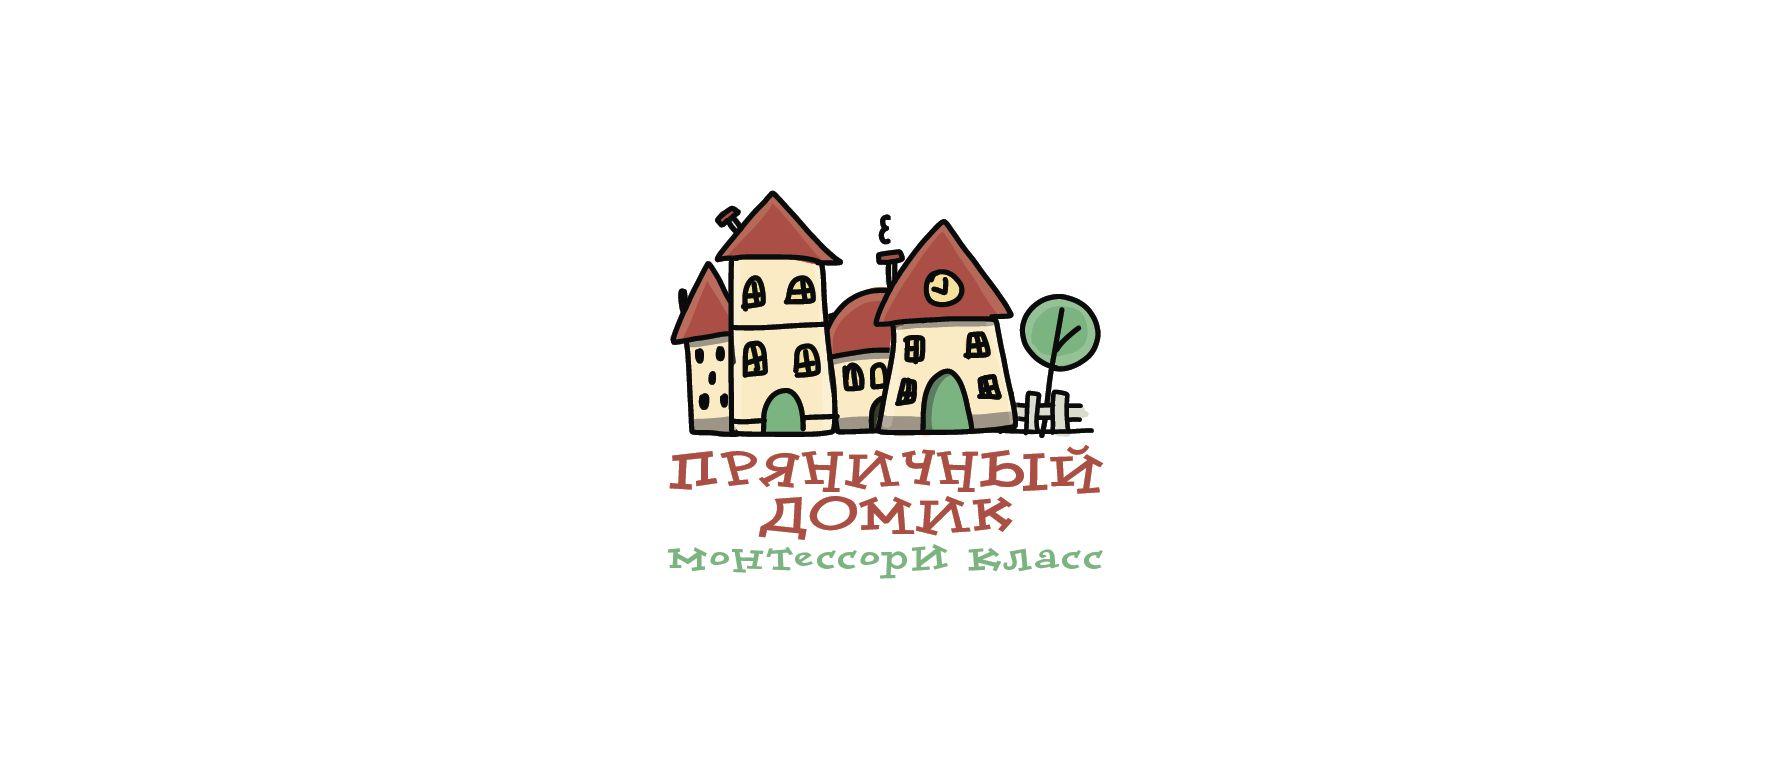 Логотип для ПРЯНИЧНЫЙ ДОМИК монтессори класс - дизайнер v-i-p-style